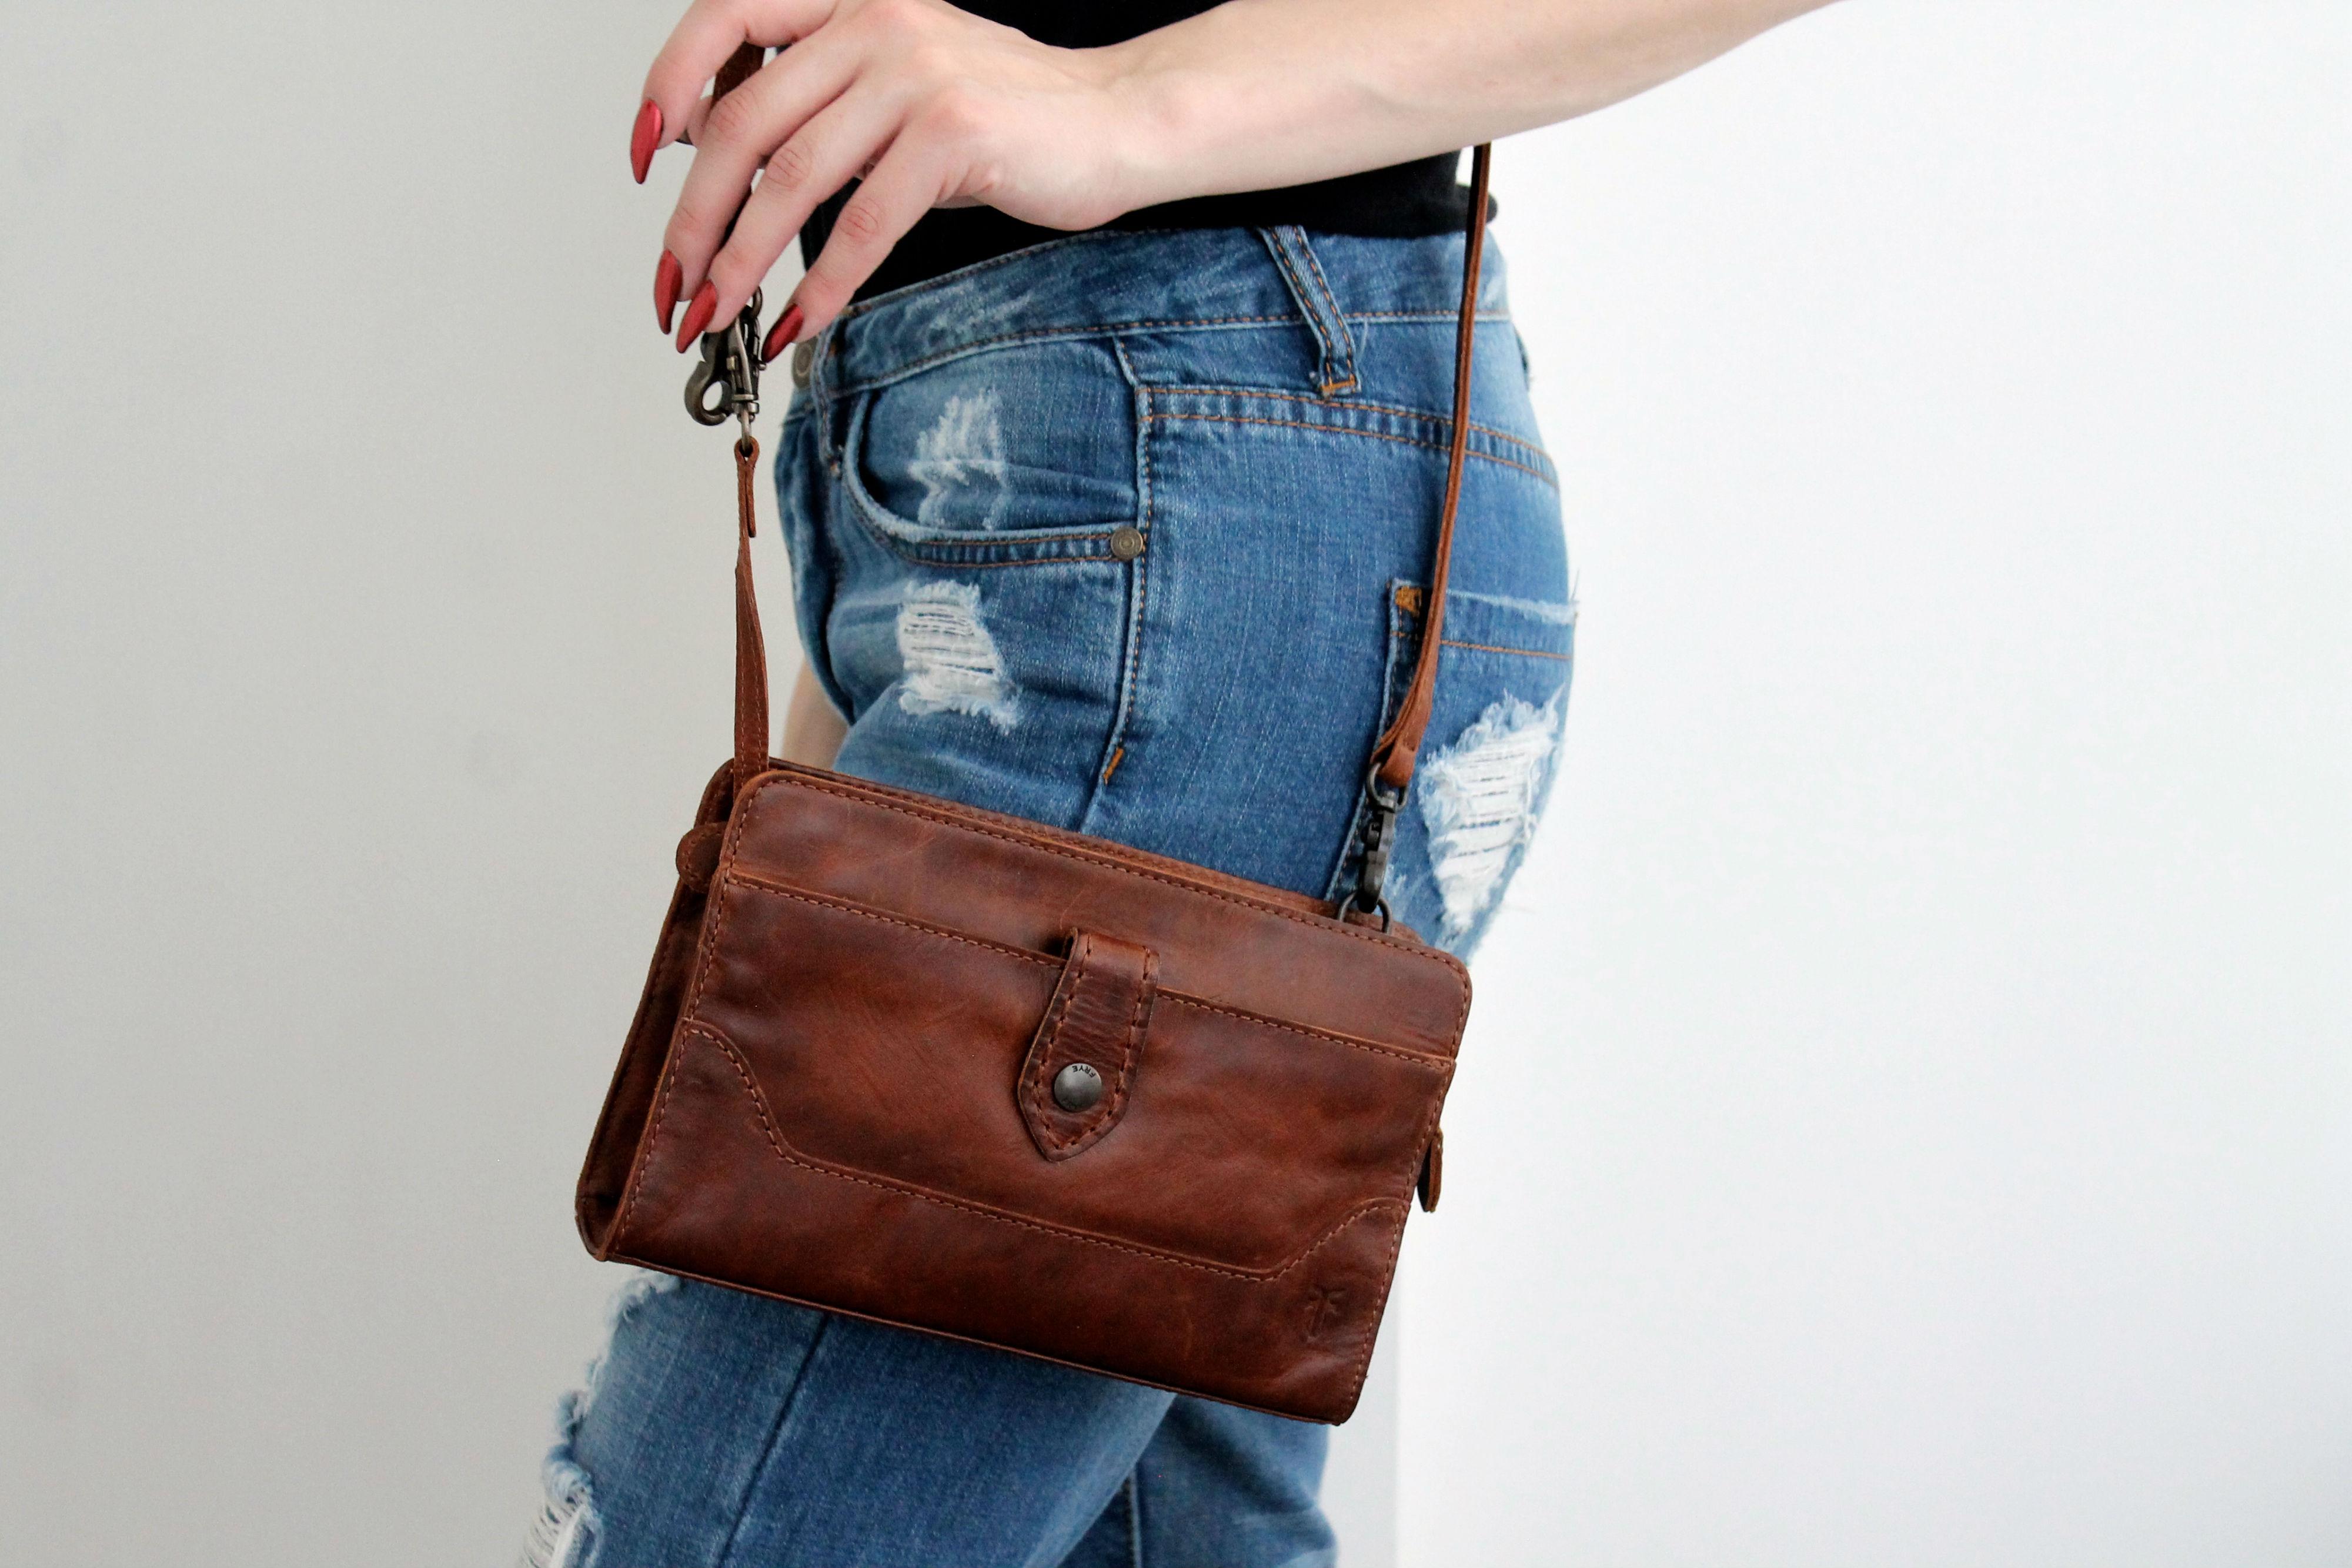 Real Leather Real Leather Handbags Handbags Toronto Real Handbags Toronto Leather Toronto trdhQs